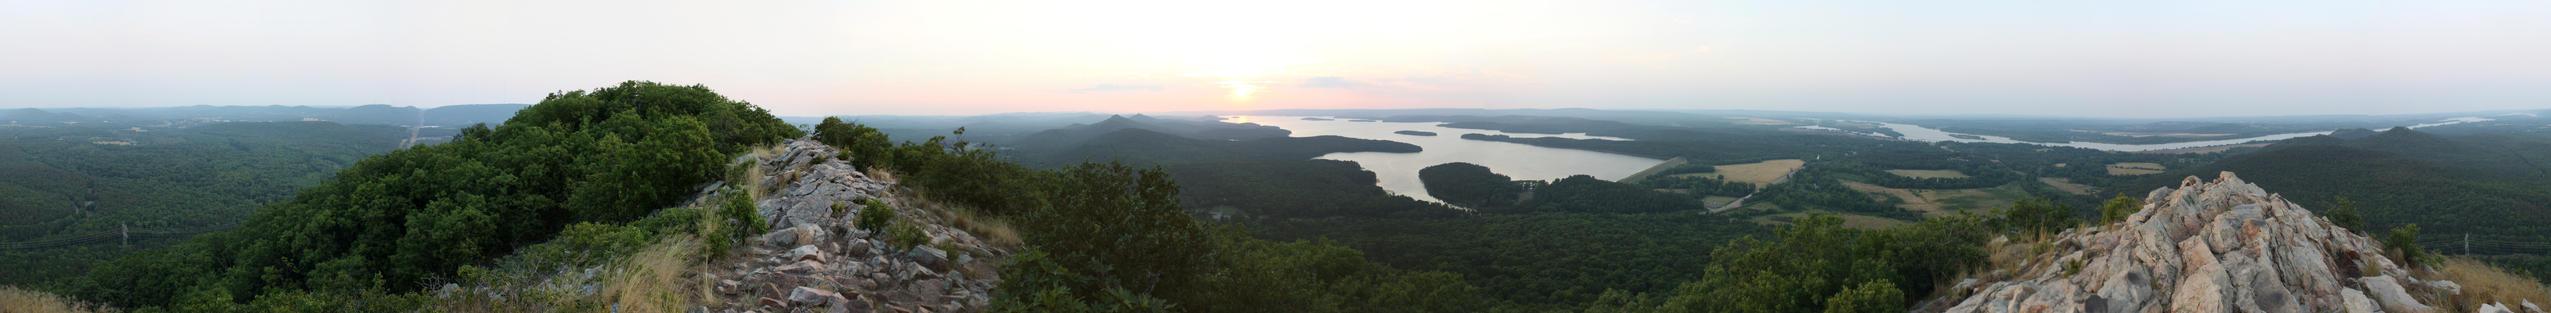 Pinnacle Mountain Panorama Just Before Sunset by smleimberg